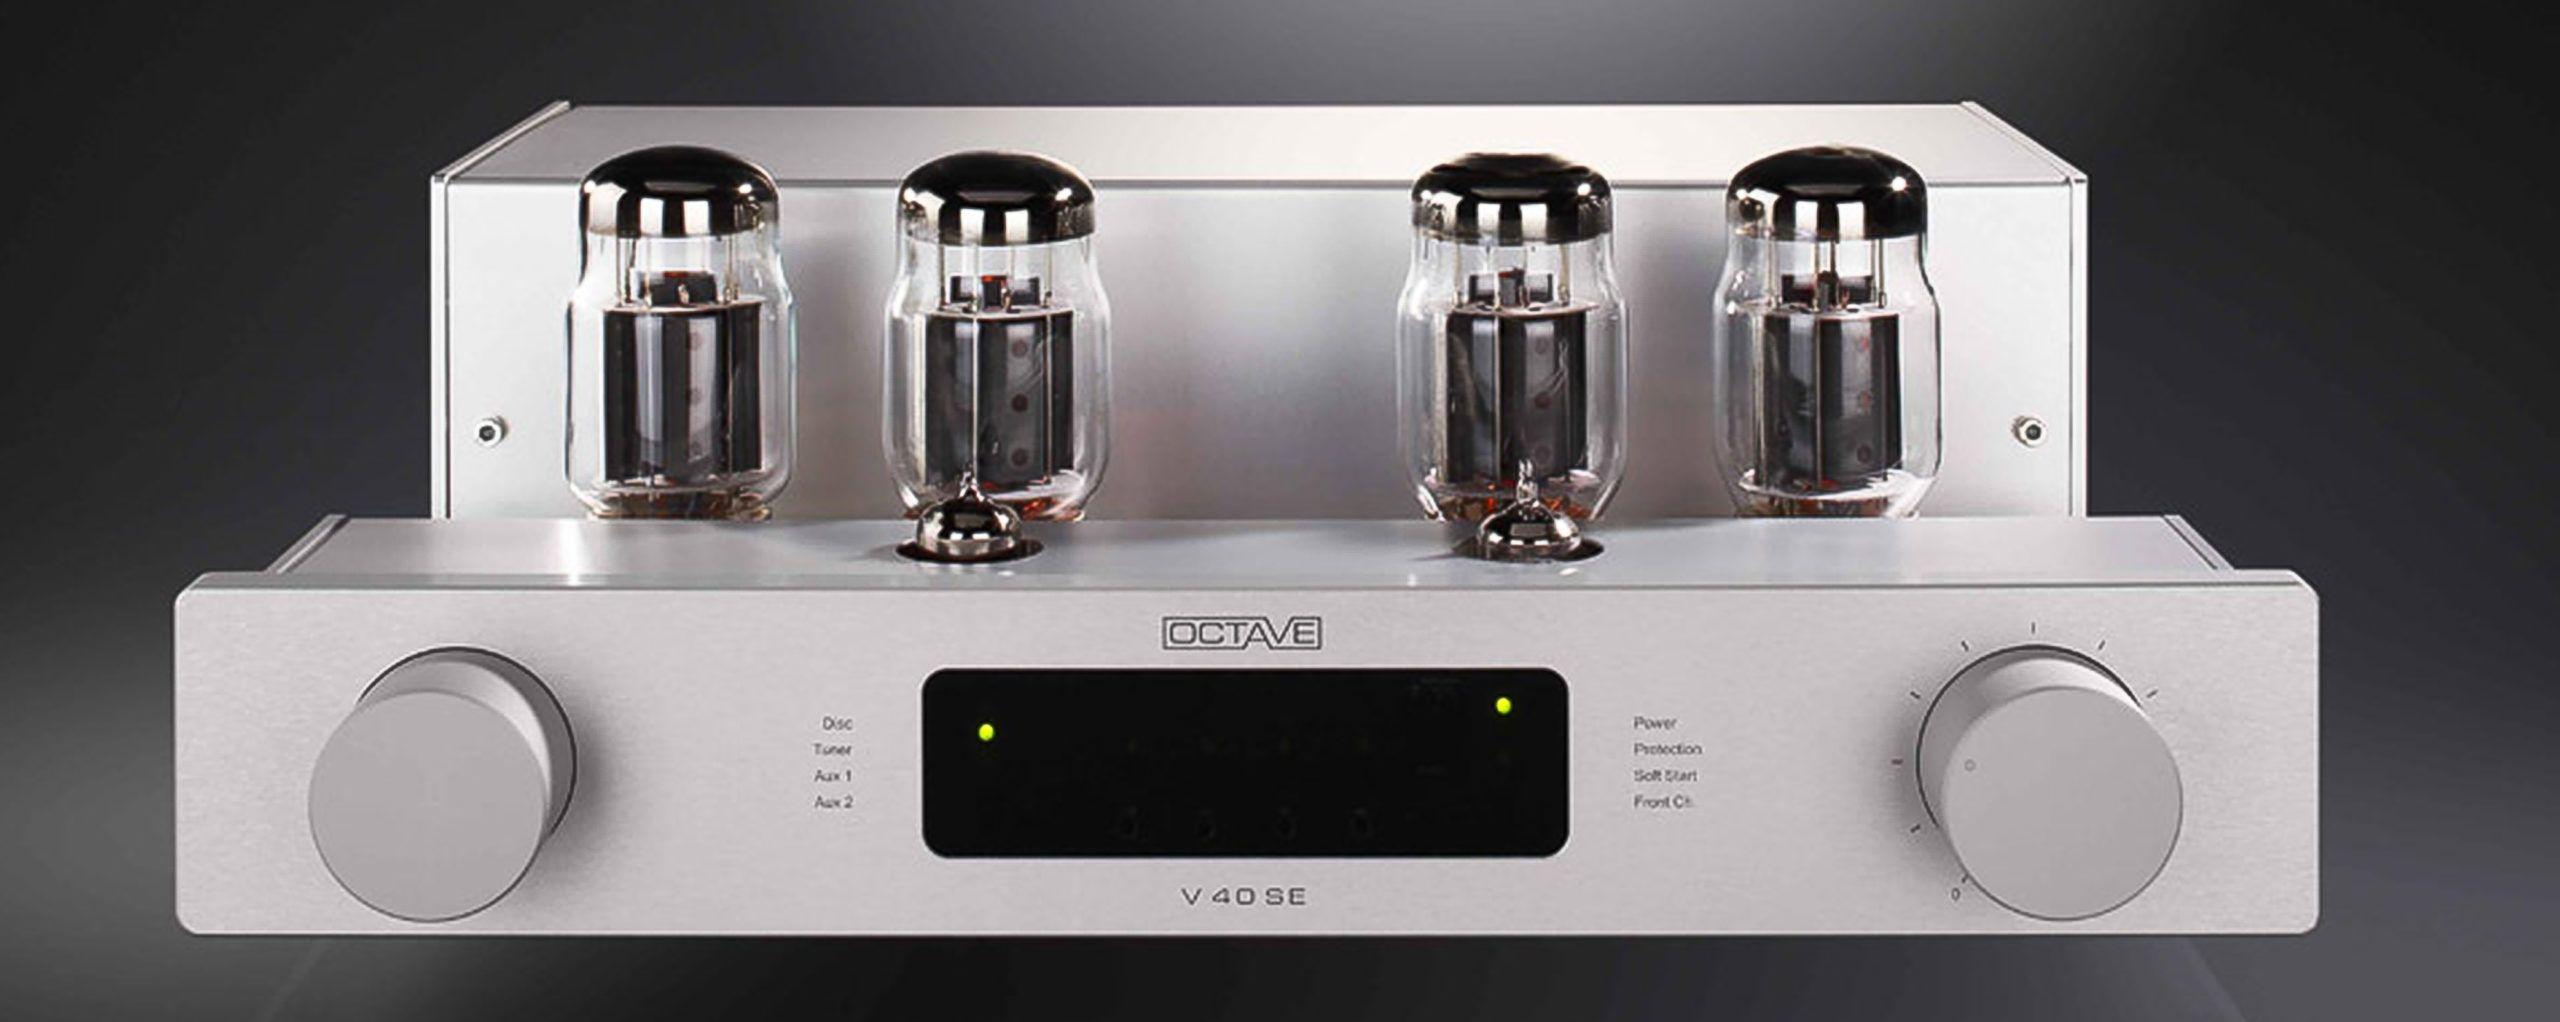 Octave Audio V 40 SE